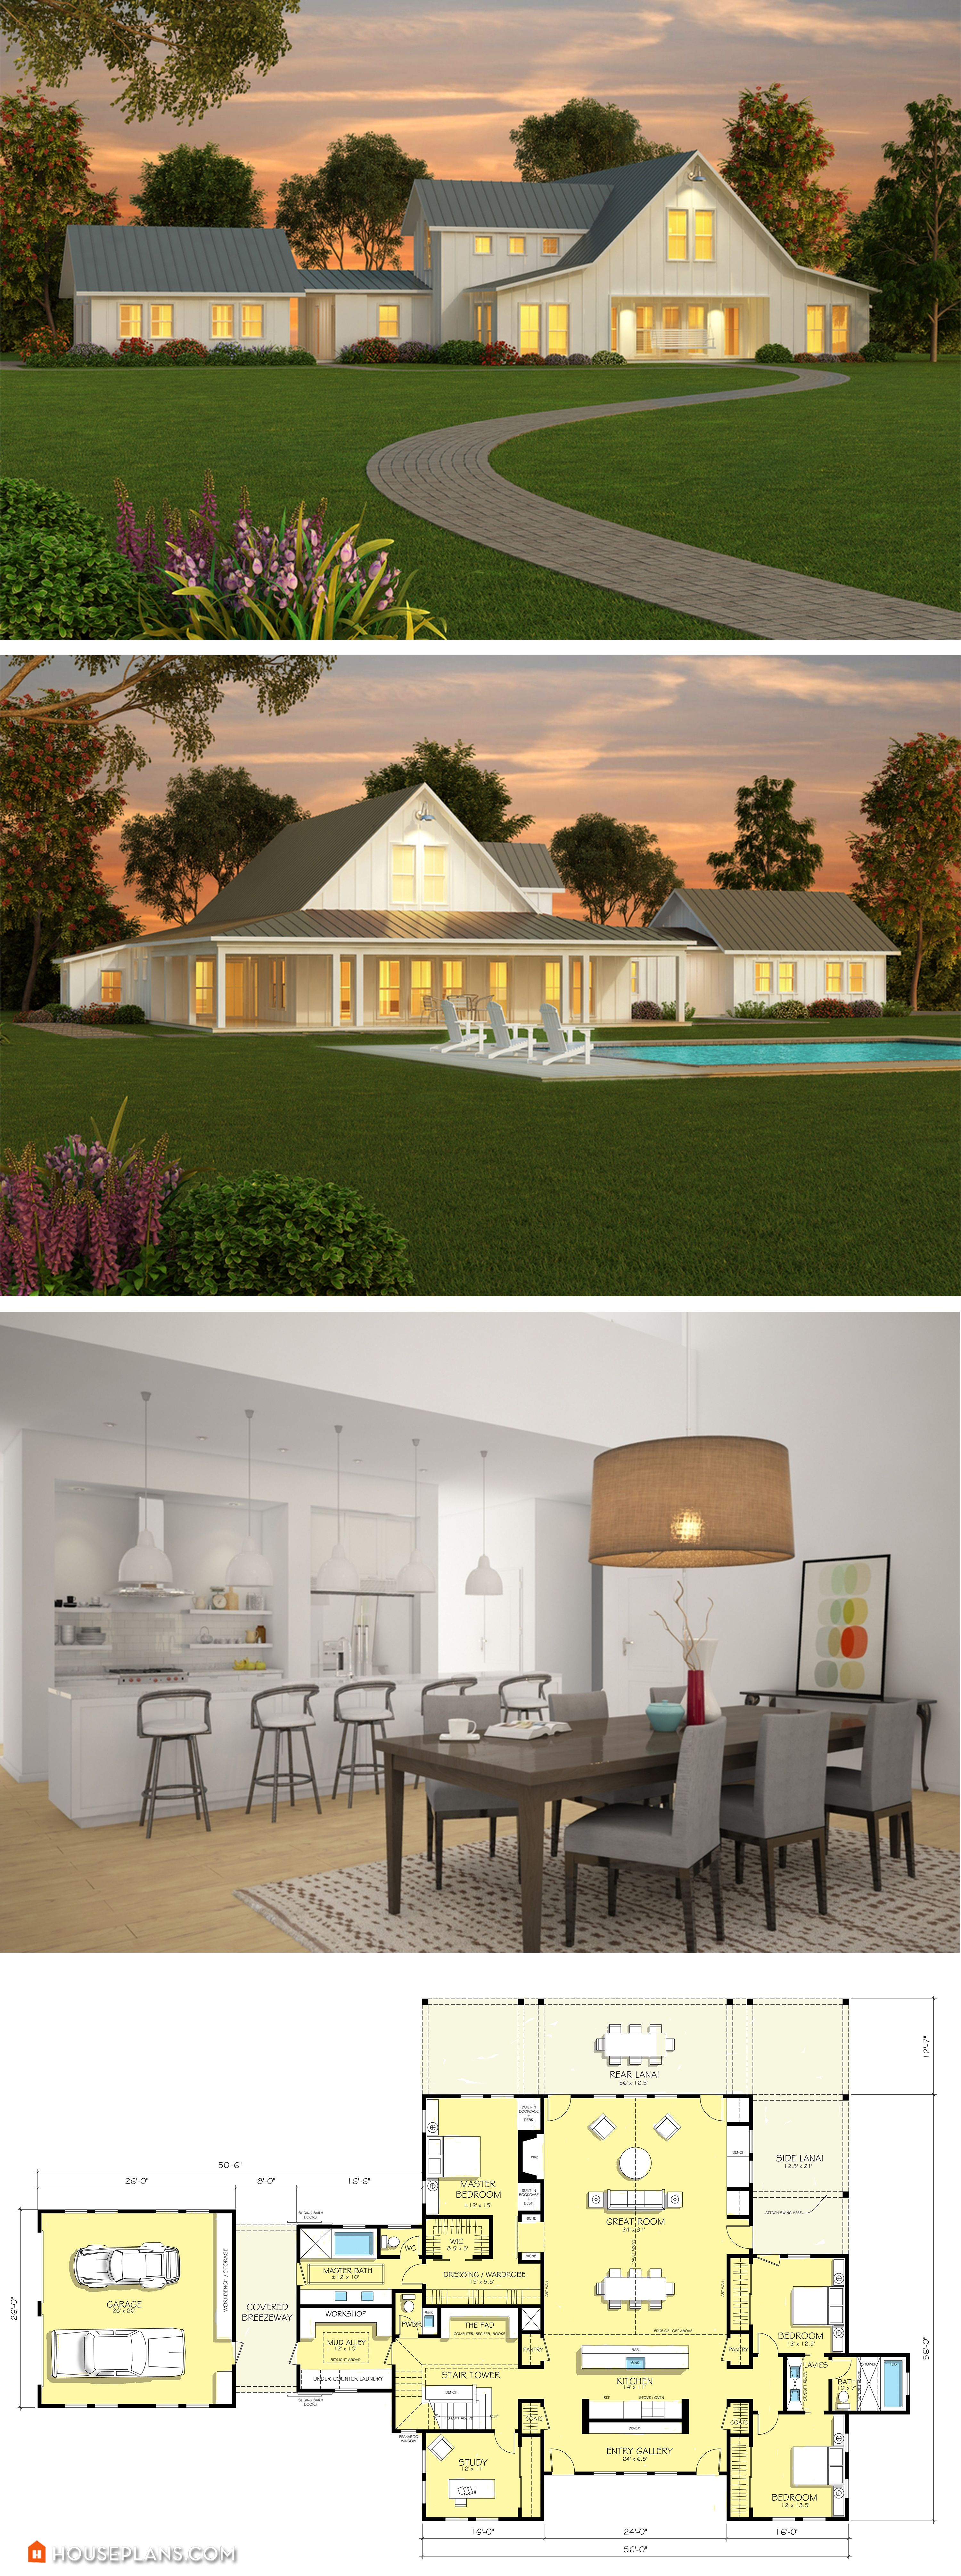 simple 3 bedroom house plans%0A Top     Metal Barndominium Floor Plans for Your Home    Farmhouse plans   Modern farmhouse and Modern